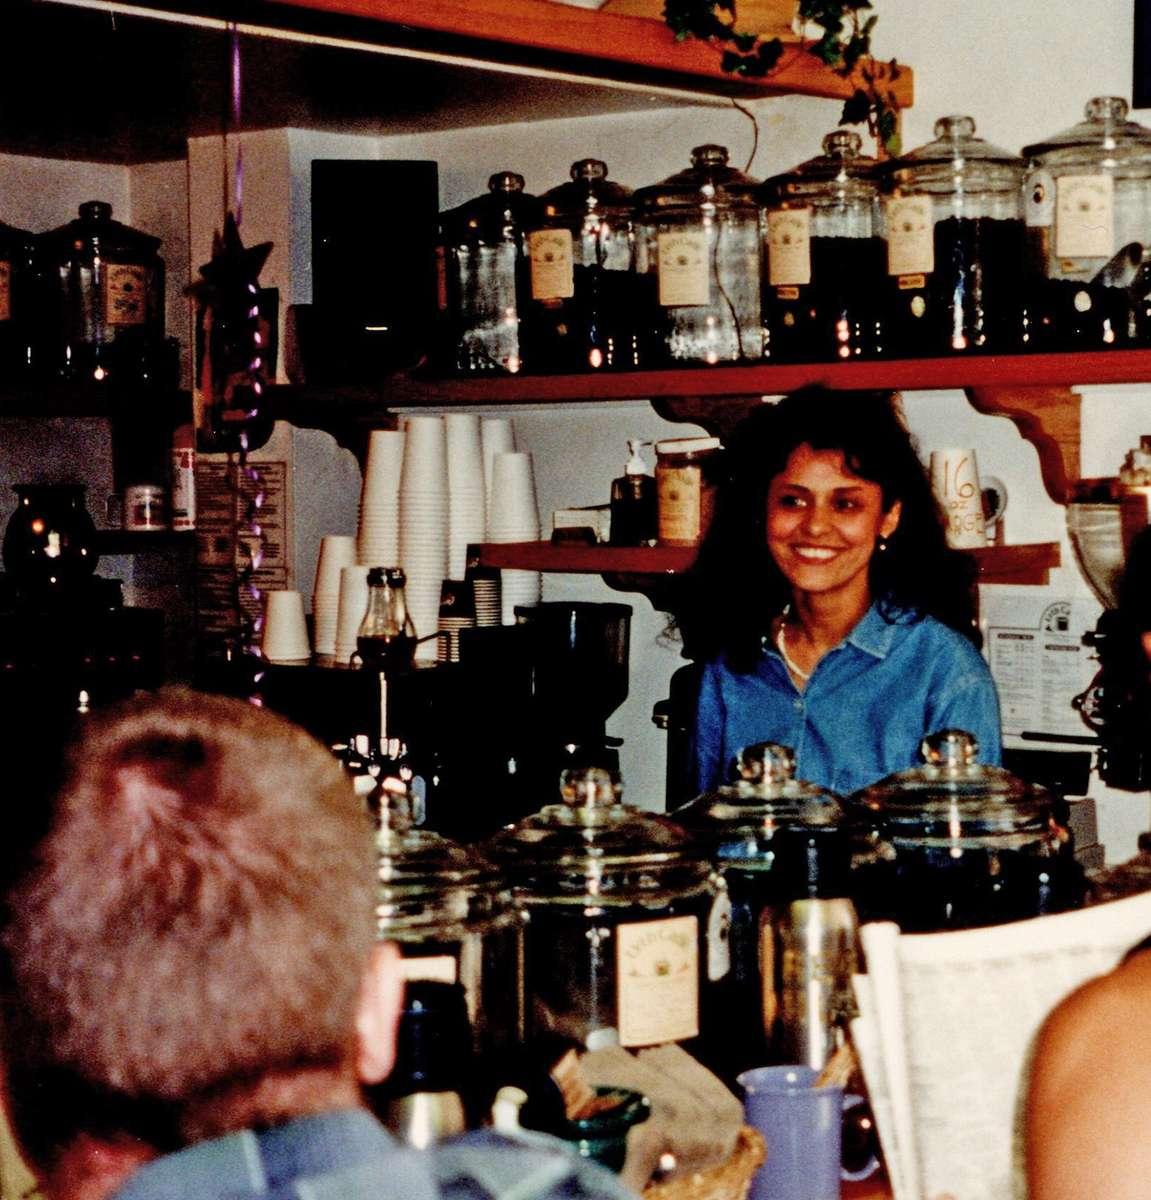 Jilla Berkman stands behind counter at cafe